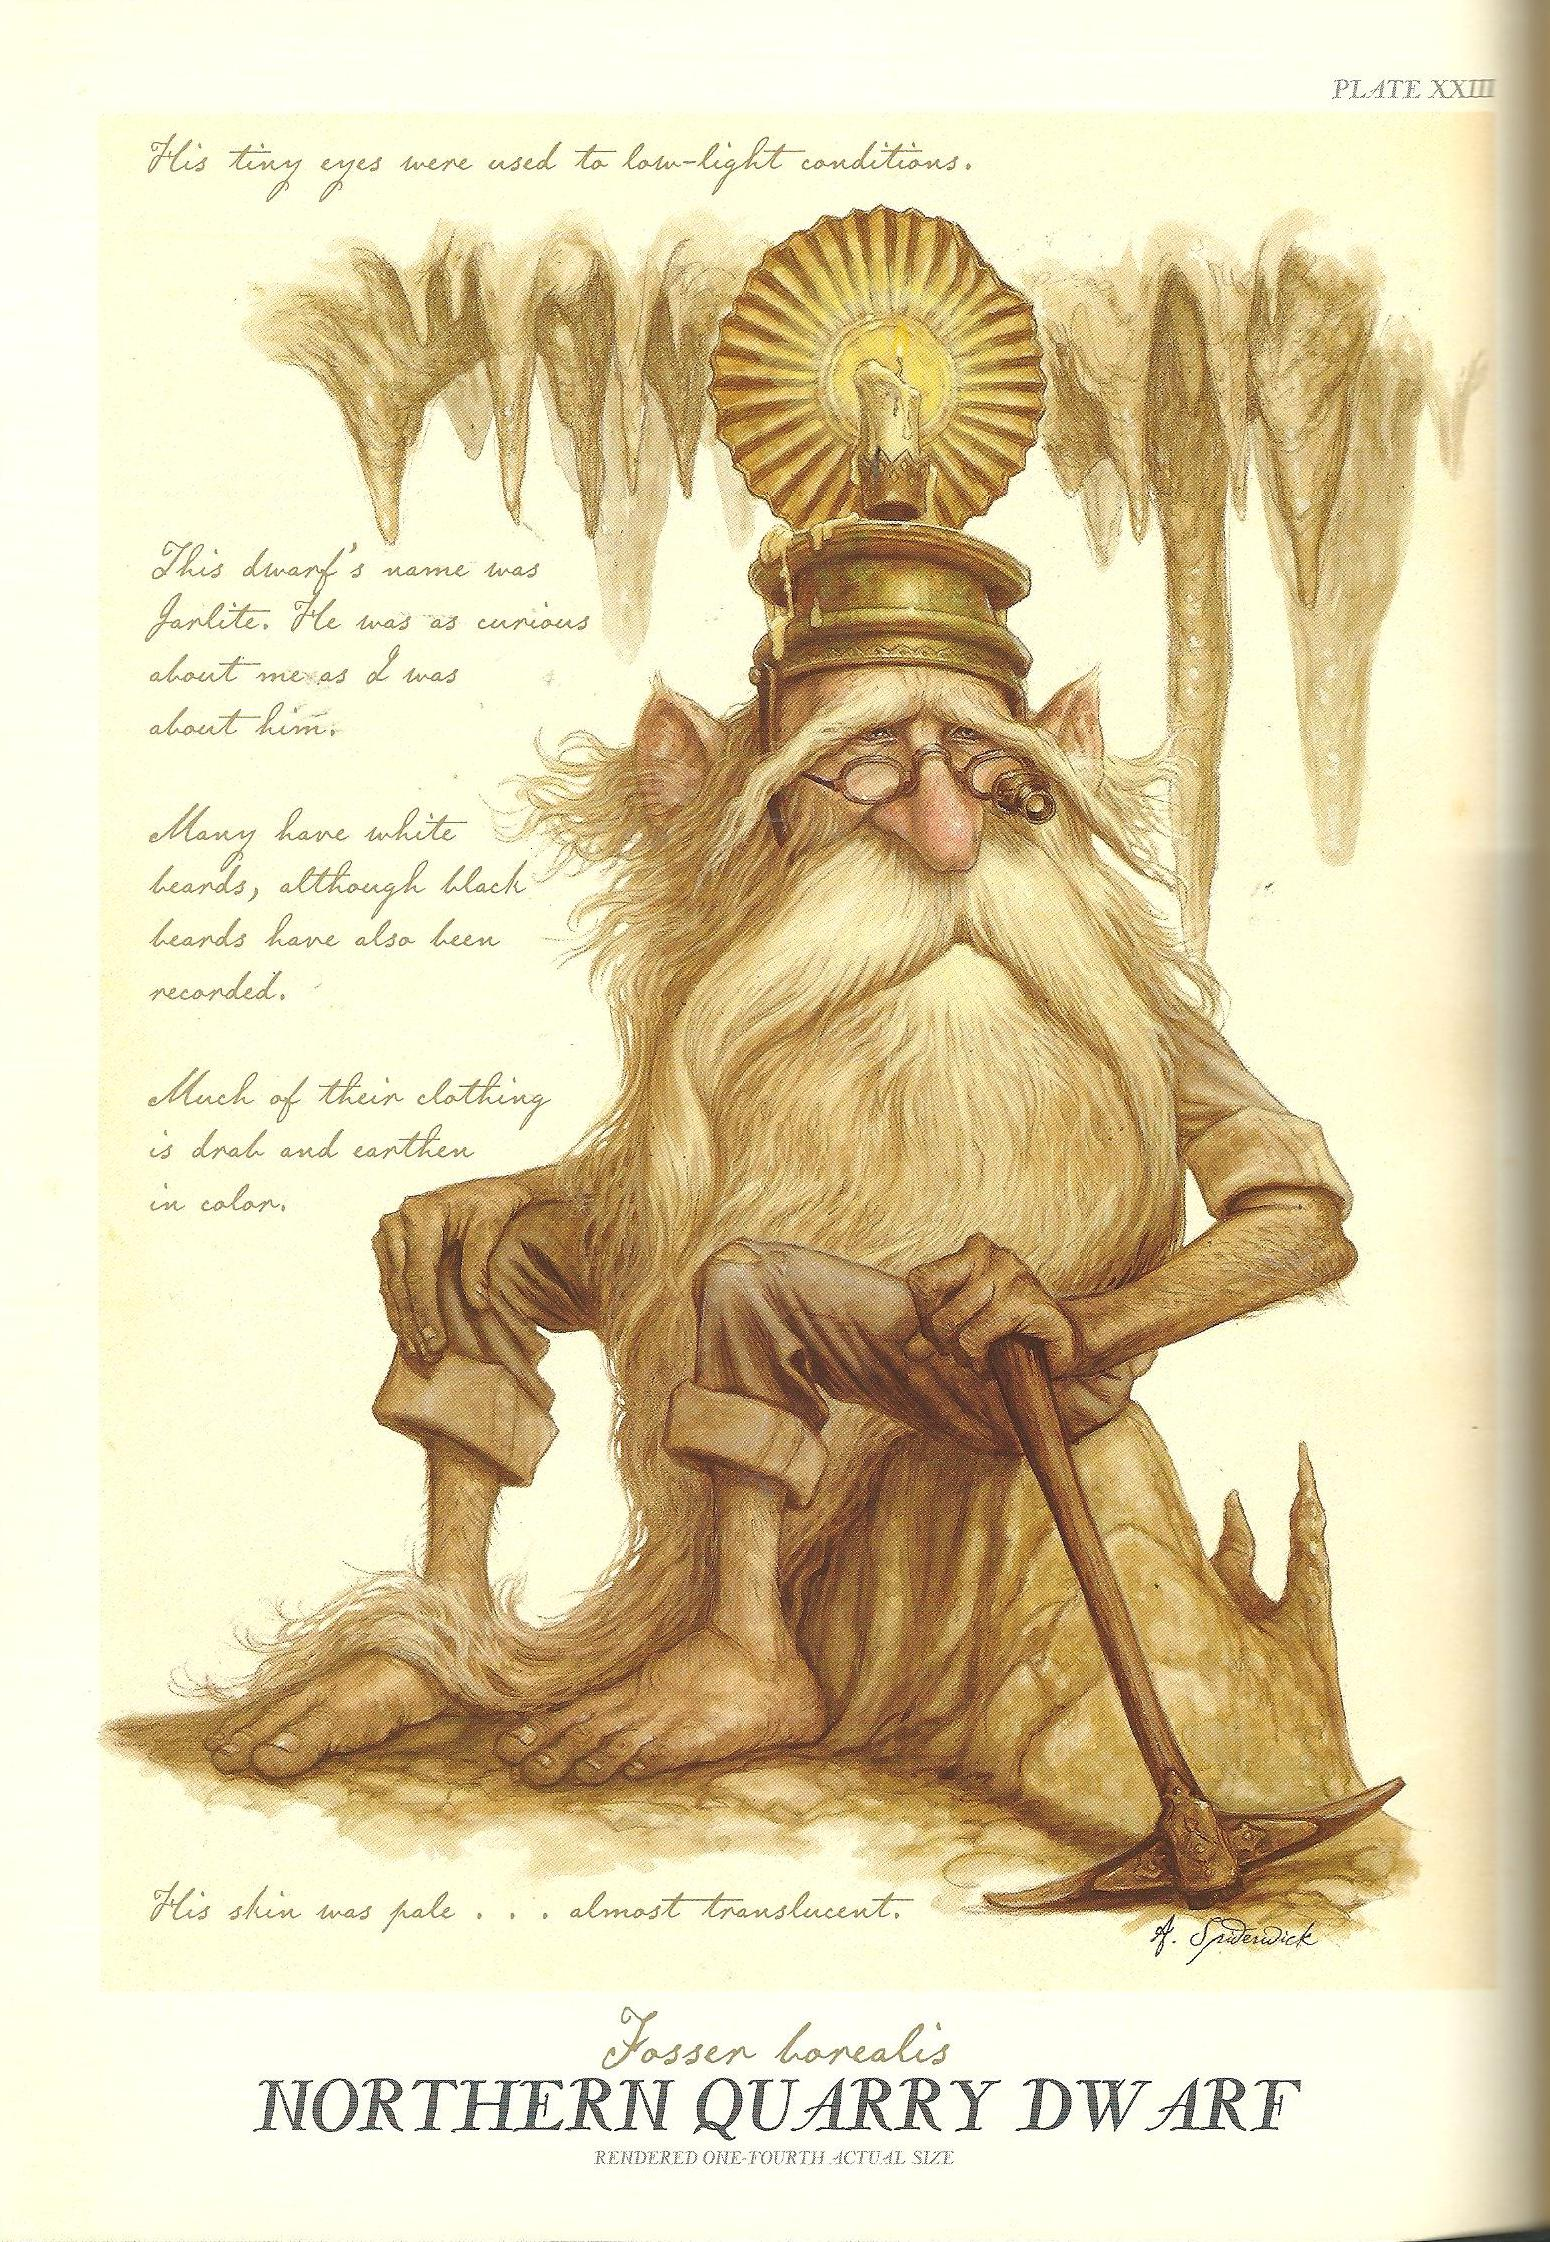 Arthur Spiderwick's Field Guide to the Fantastical World ...